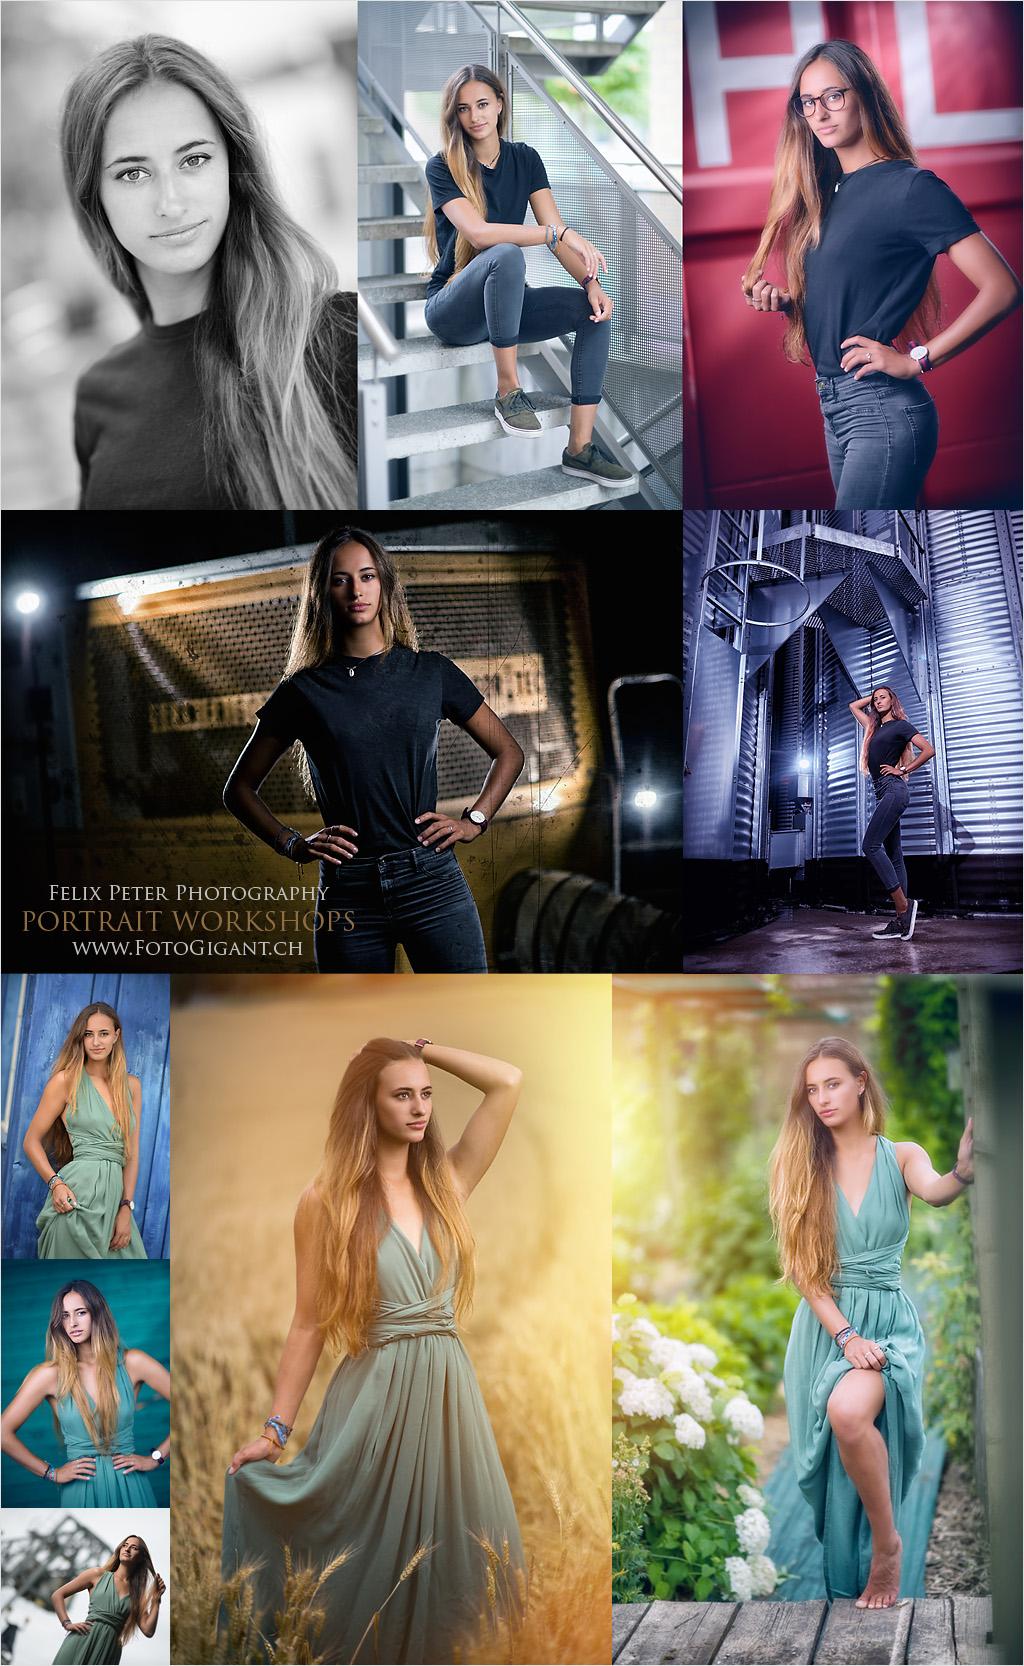 Portraitworkshop_Bern_2.jpg